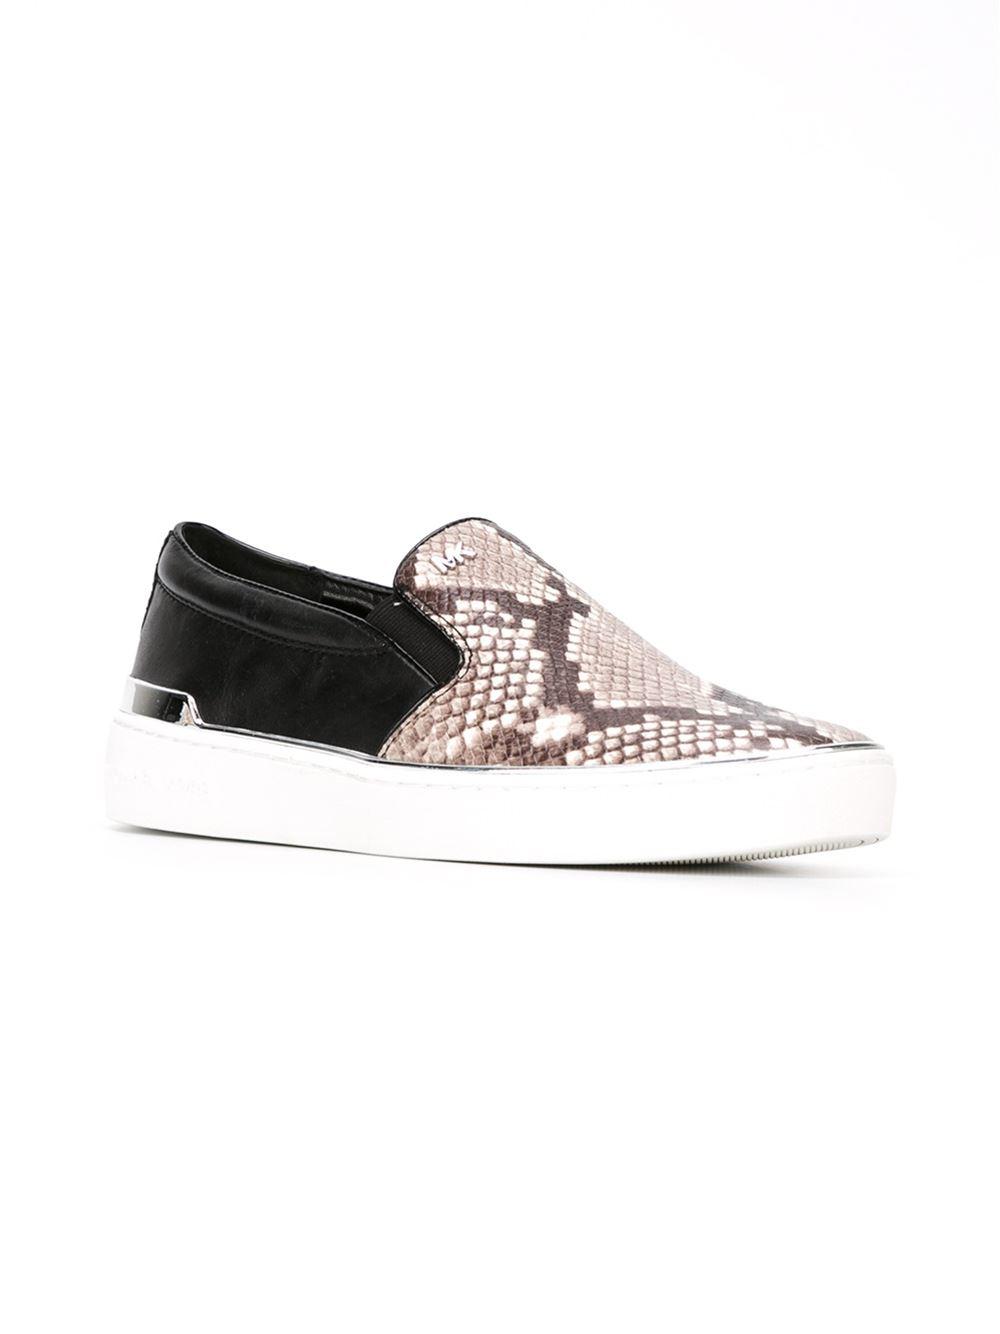 Michael Michael Kors Python Print Slip On Sneakers In